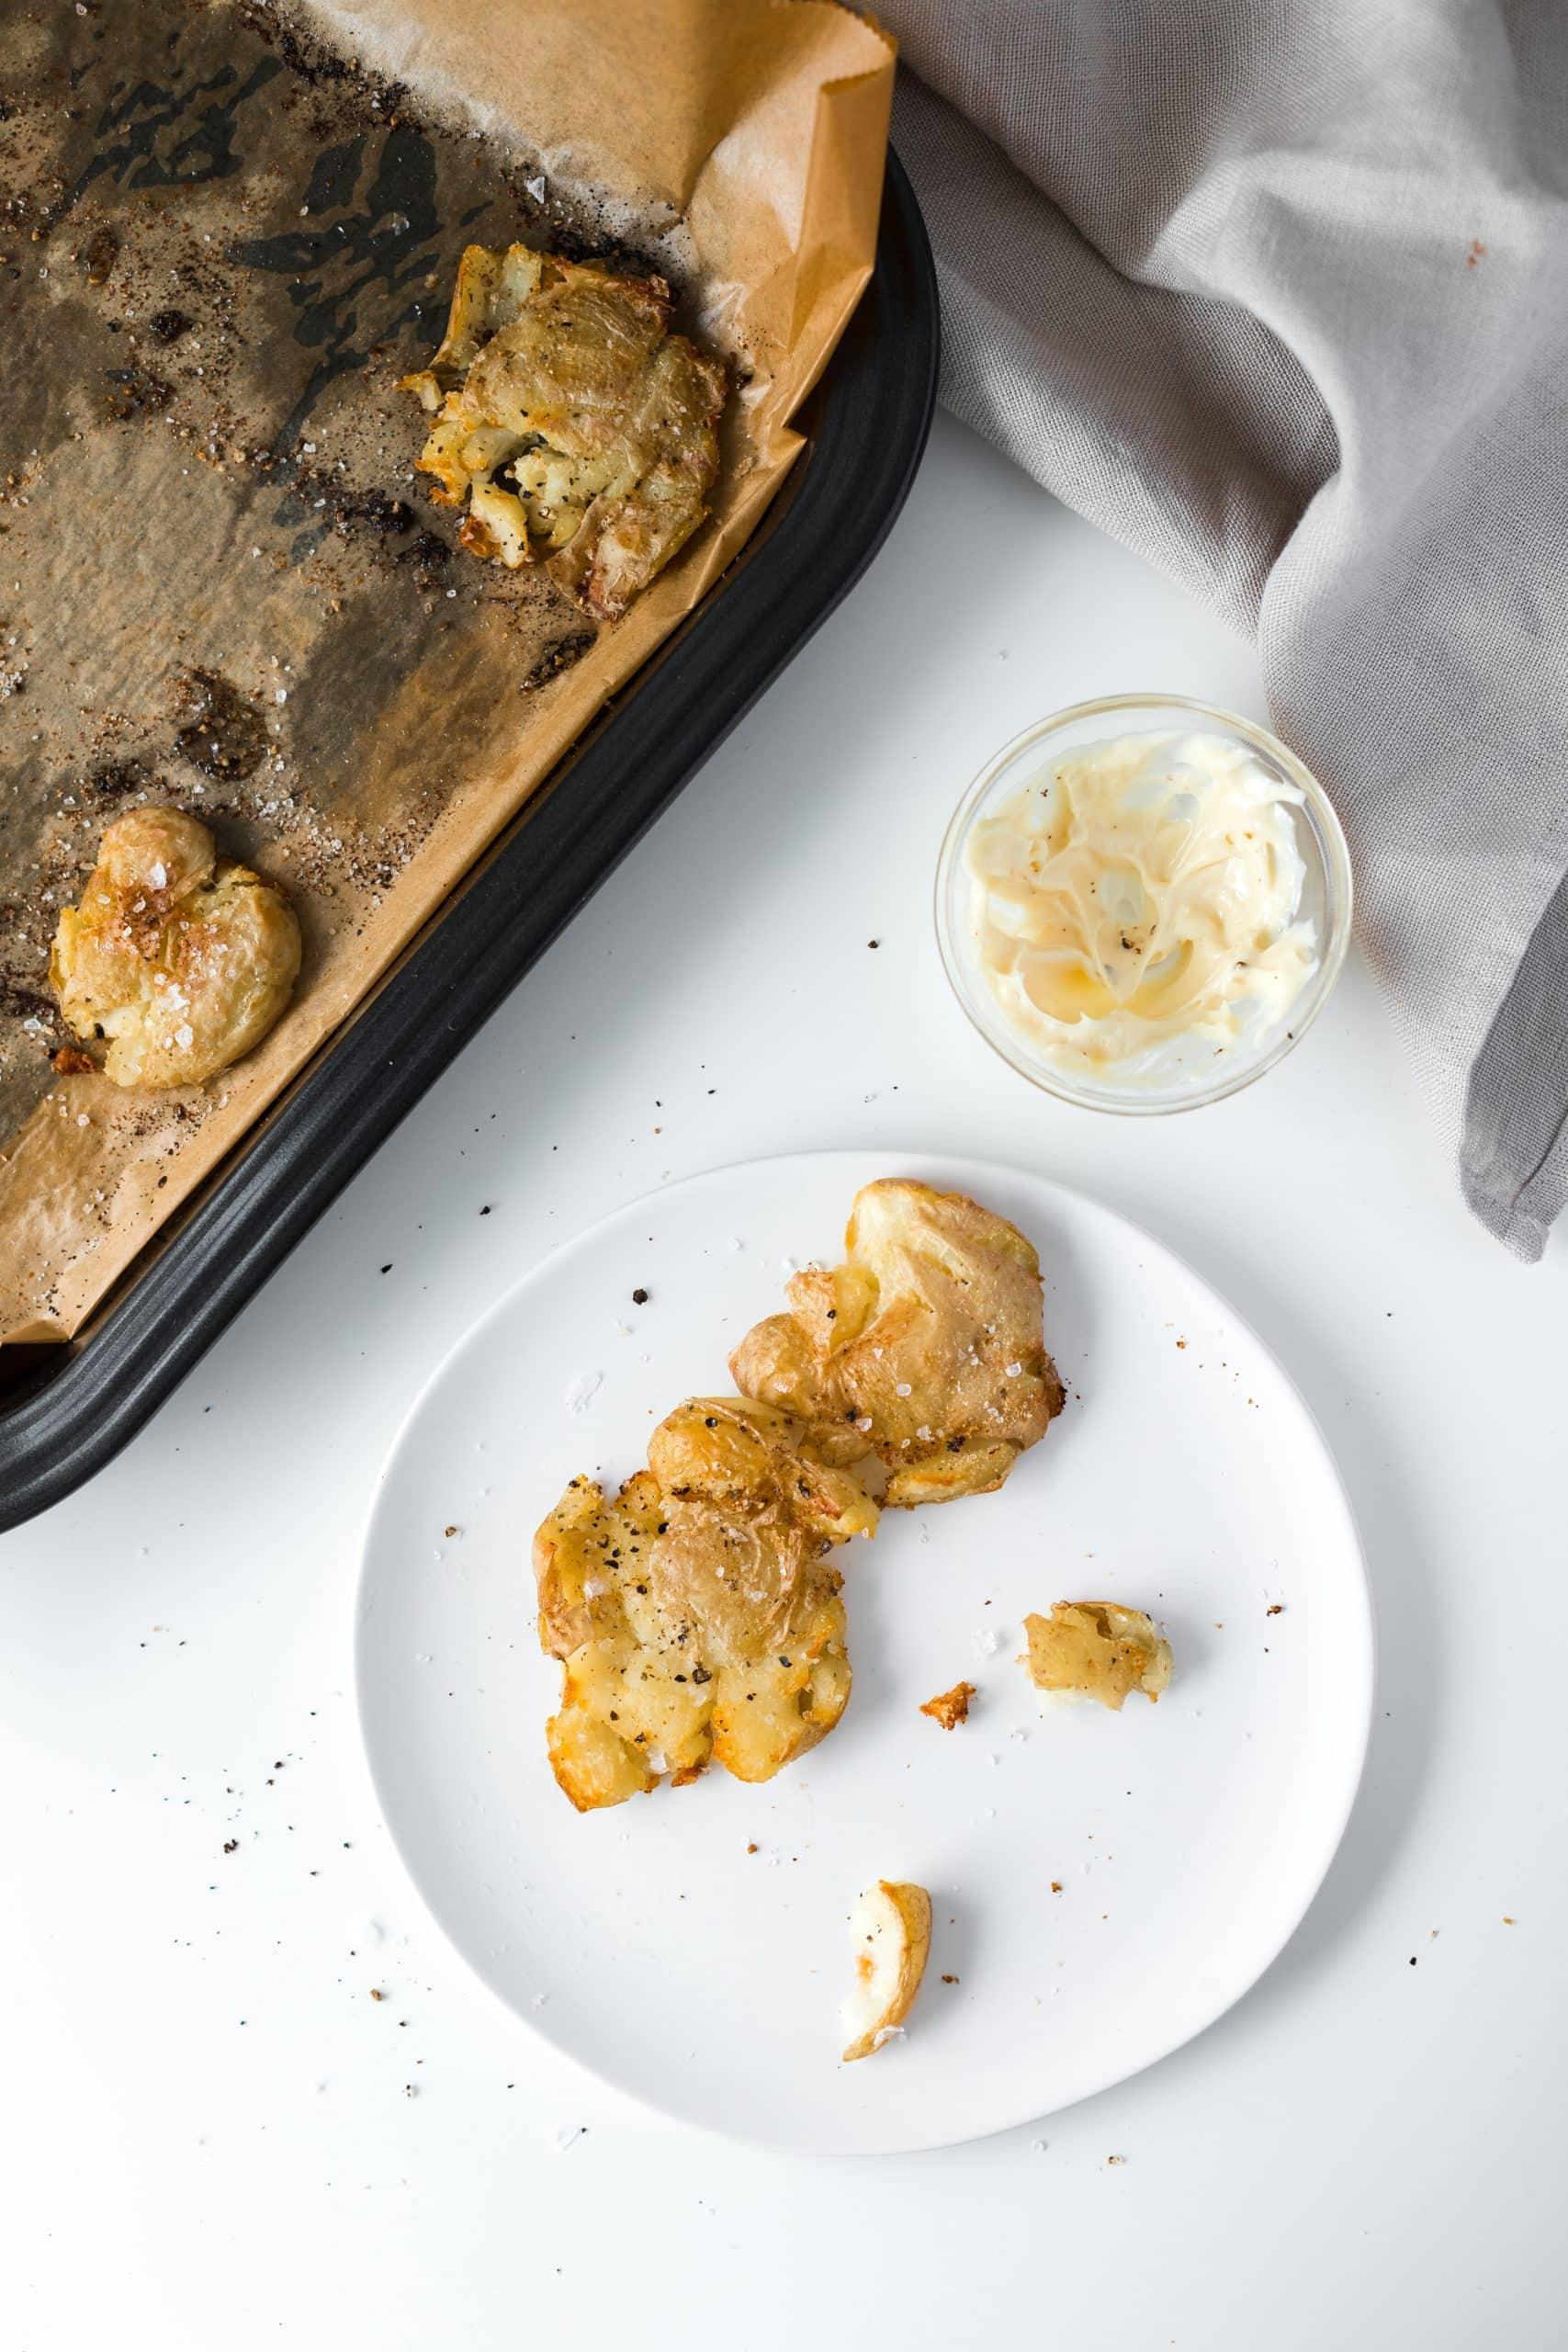 Crispy Smashed Potatoes with Garlic Aioli